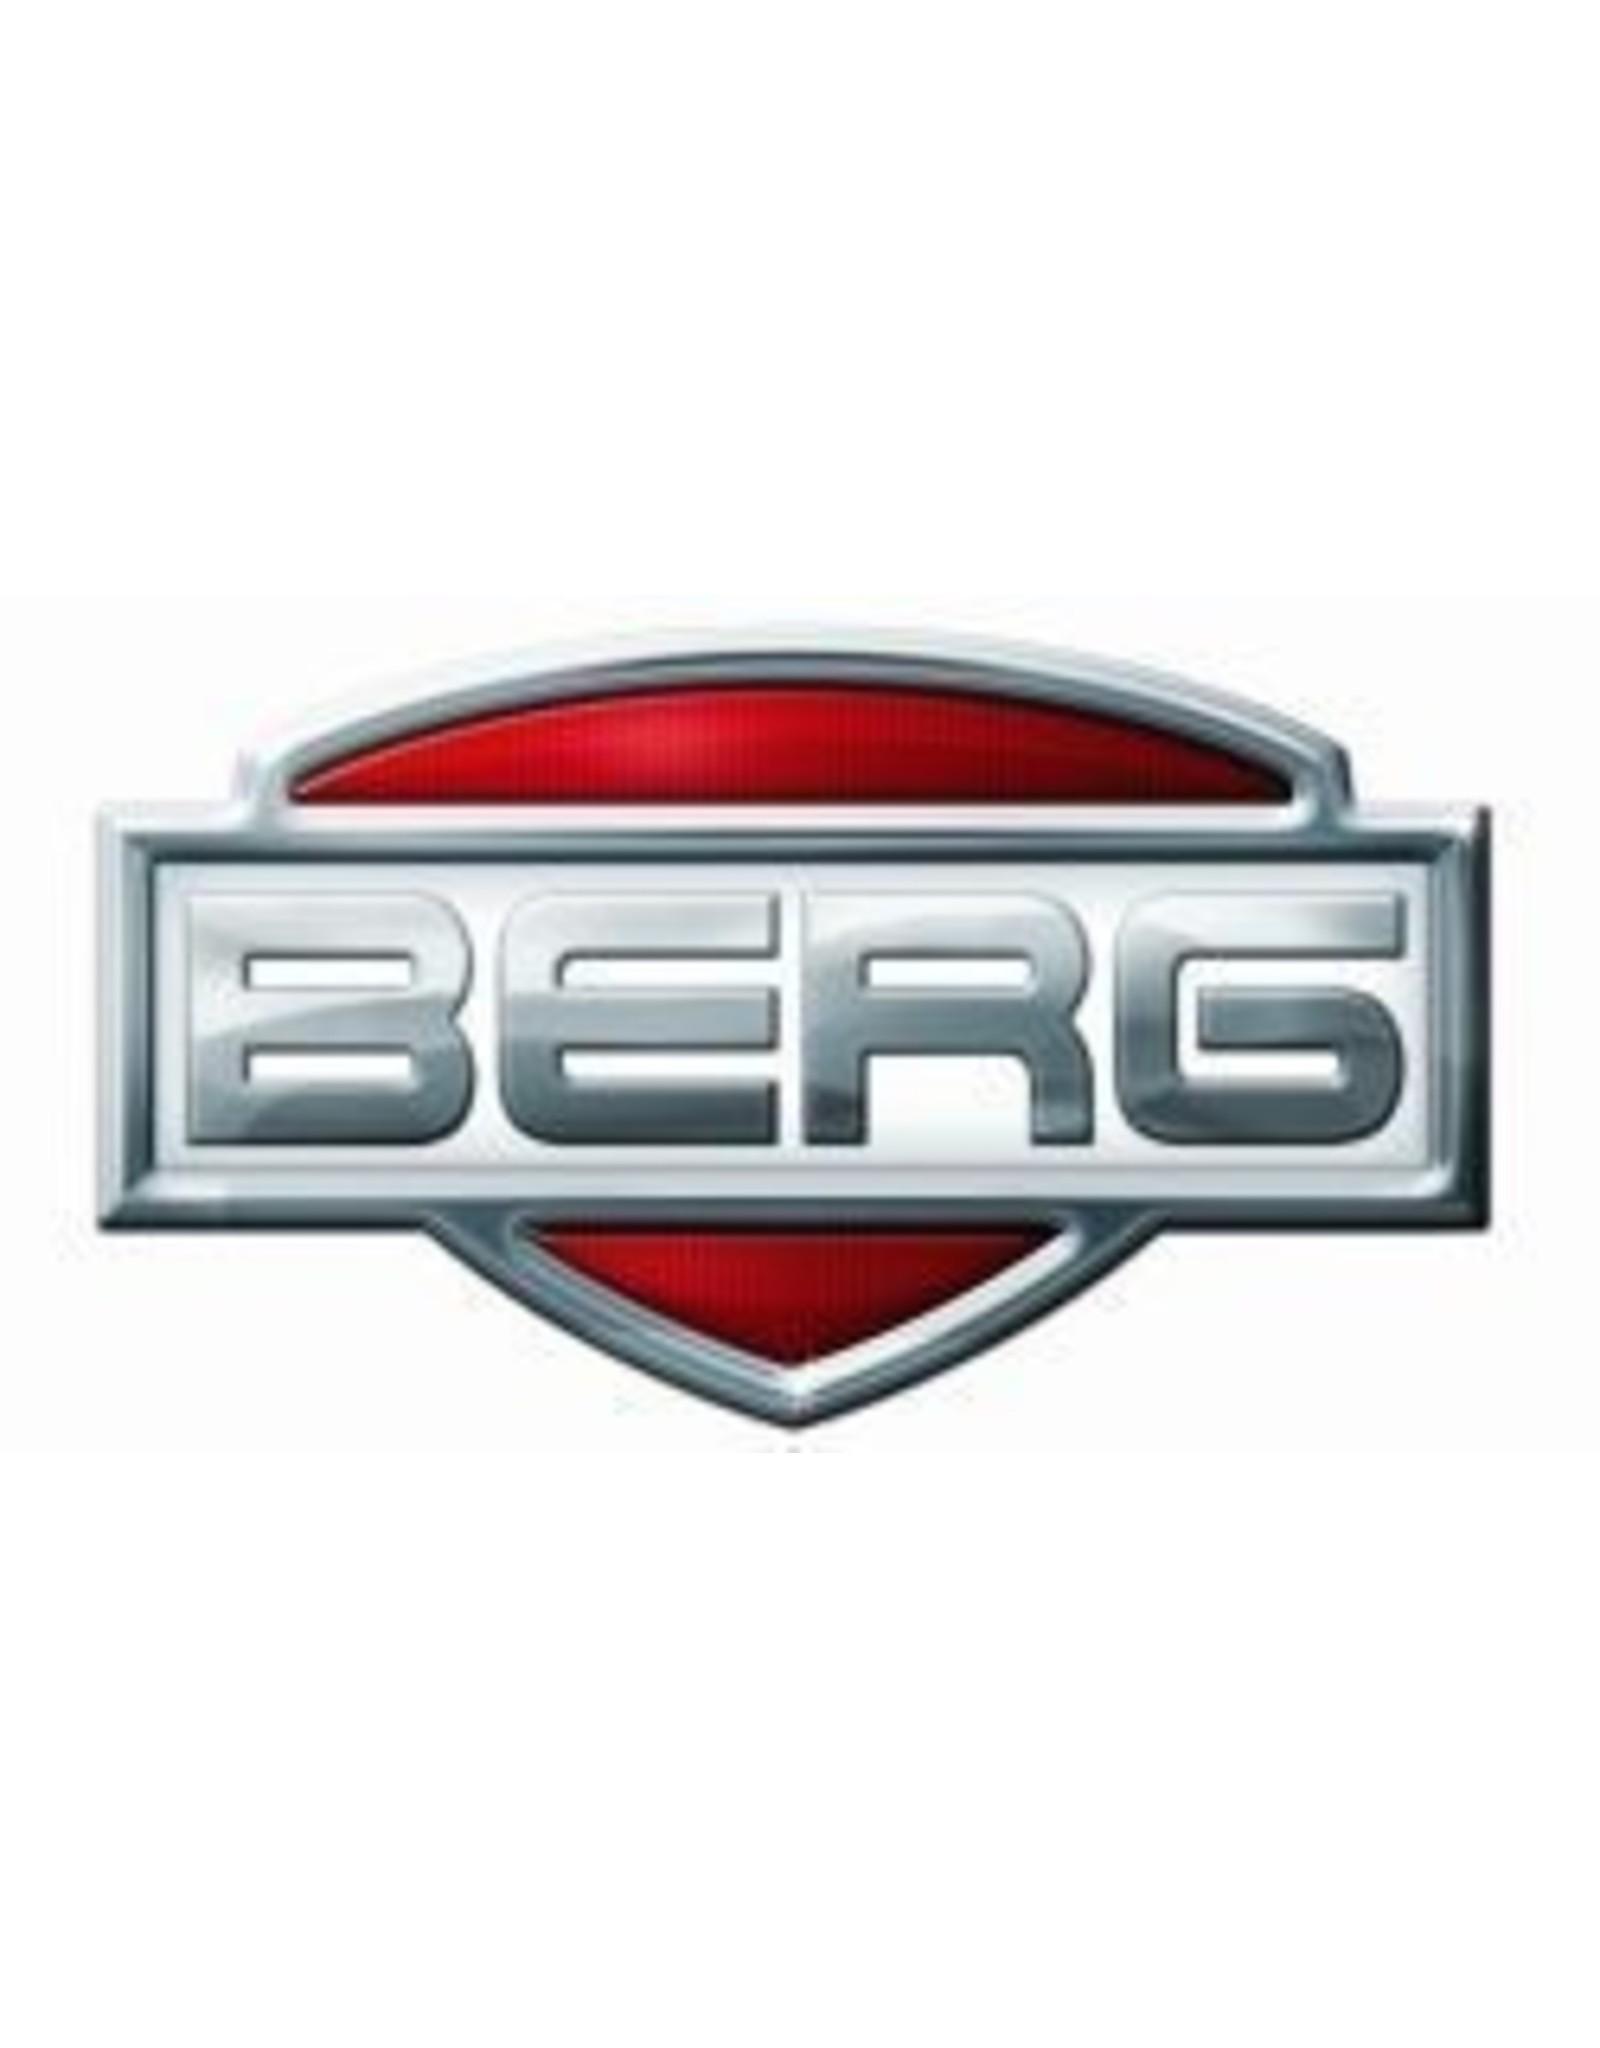 BERG BERG Flatground - Beschermrand Band Veer (8x)